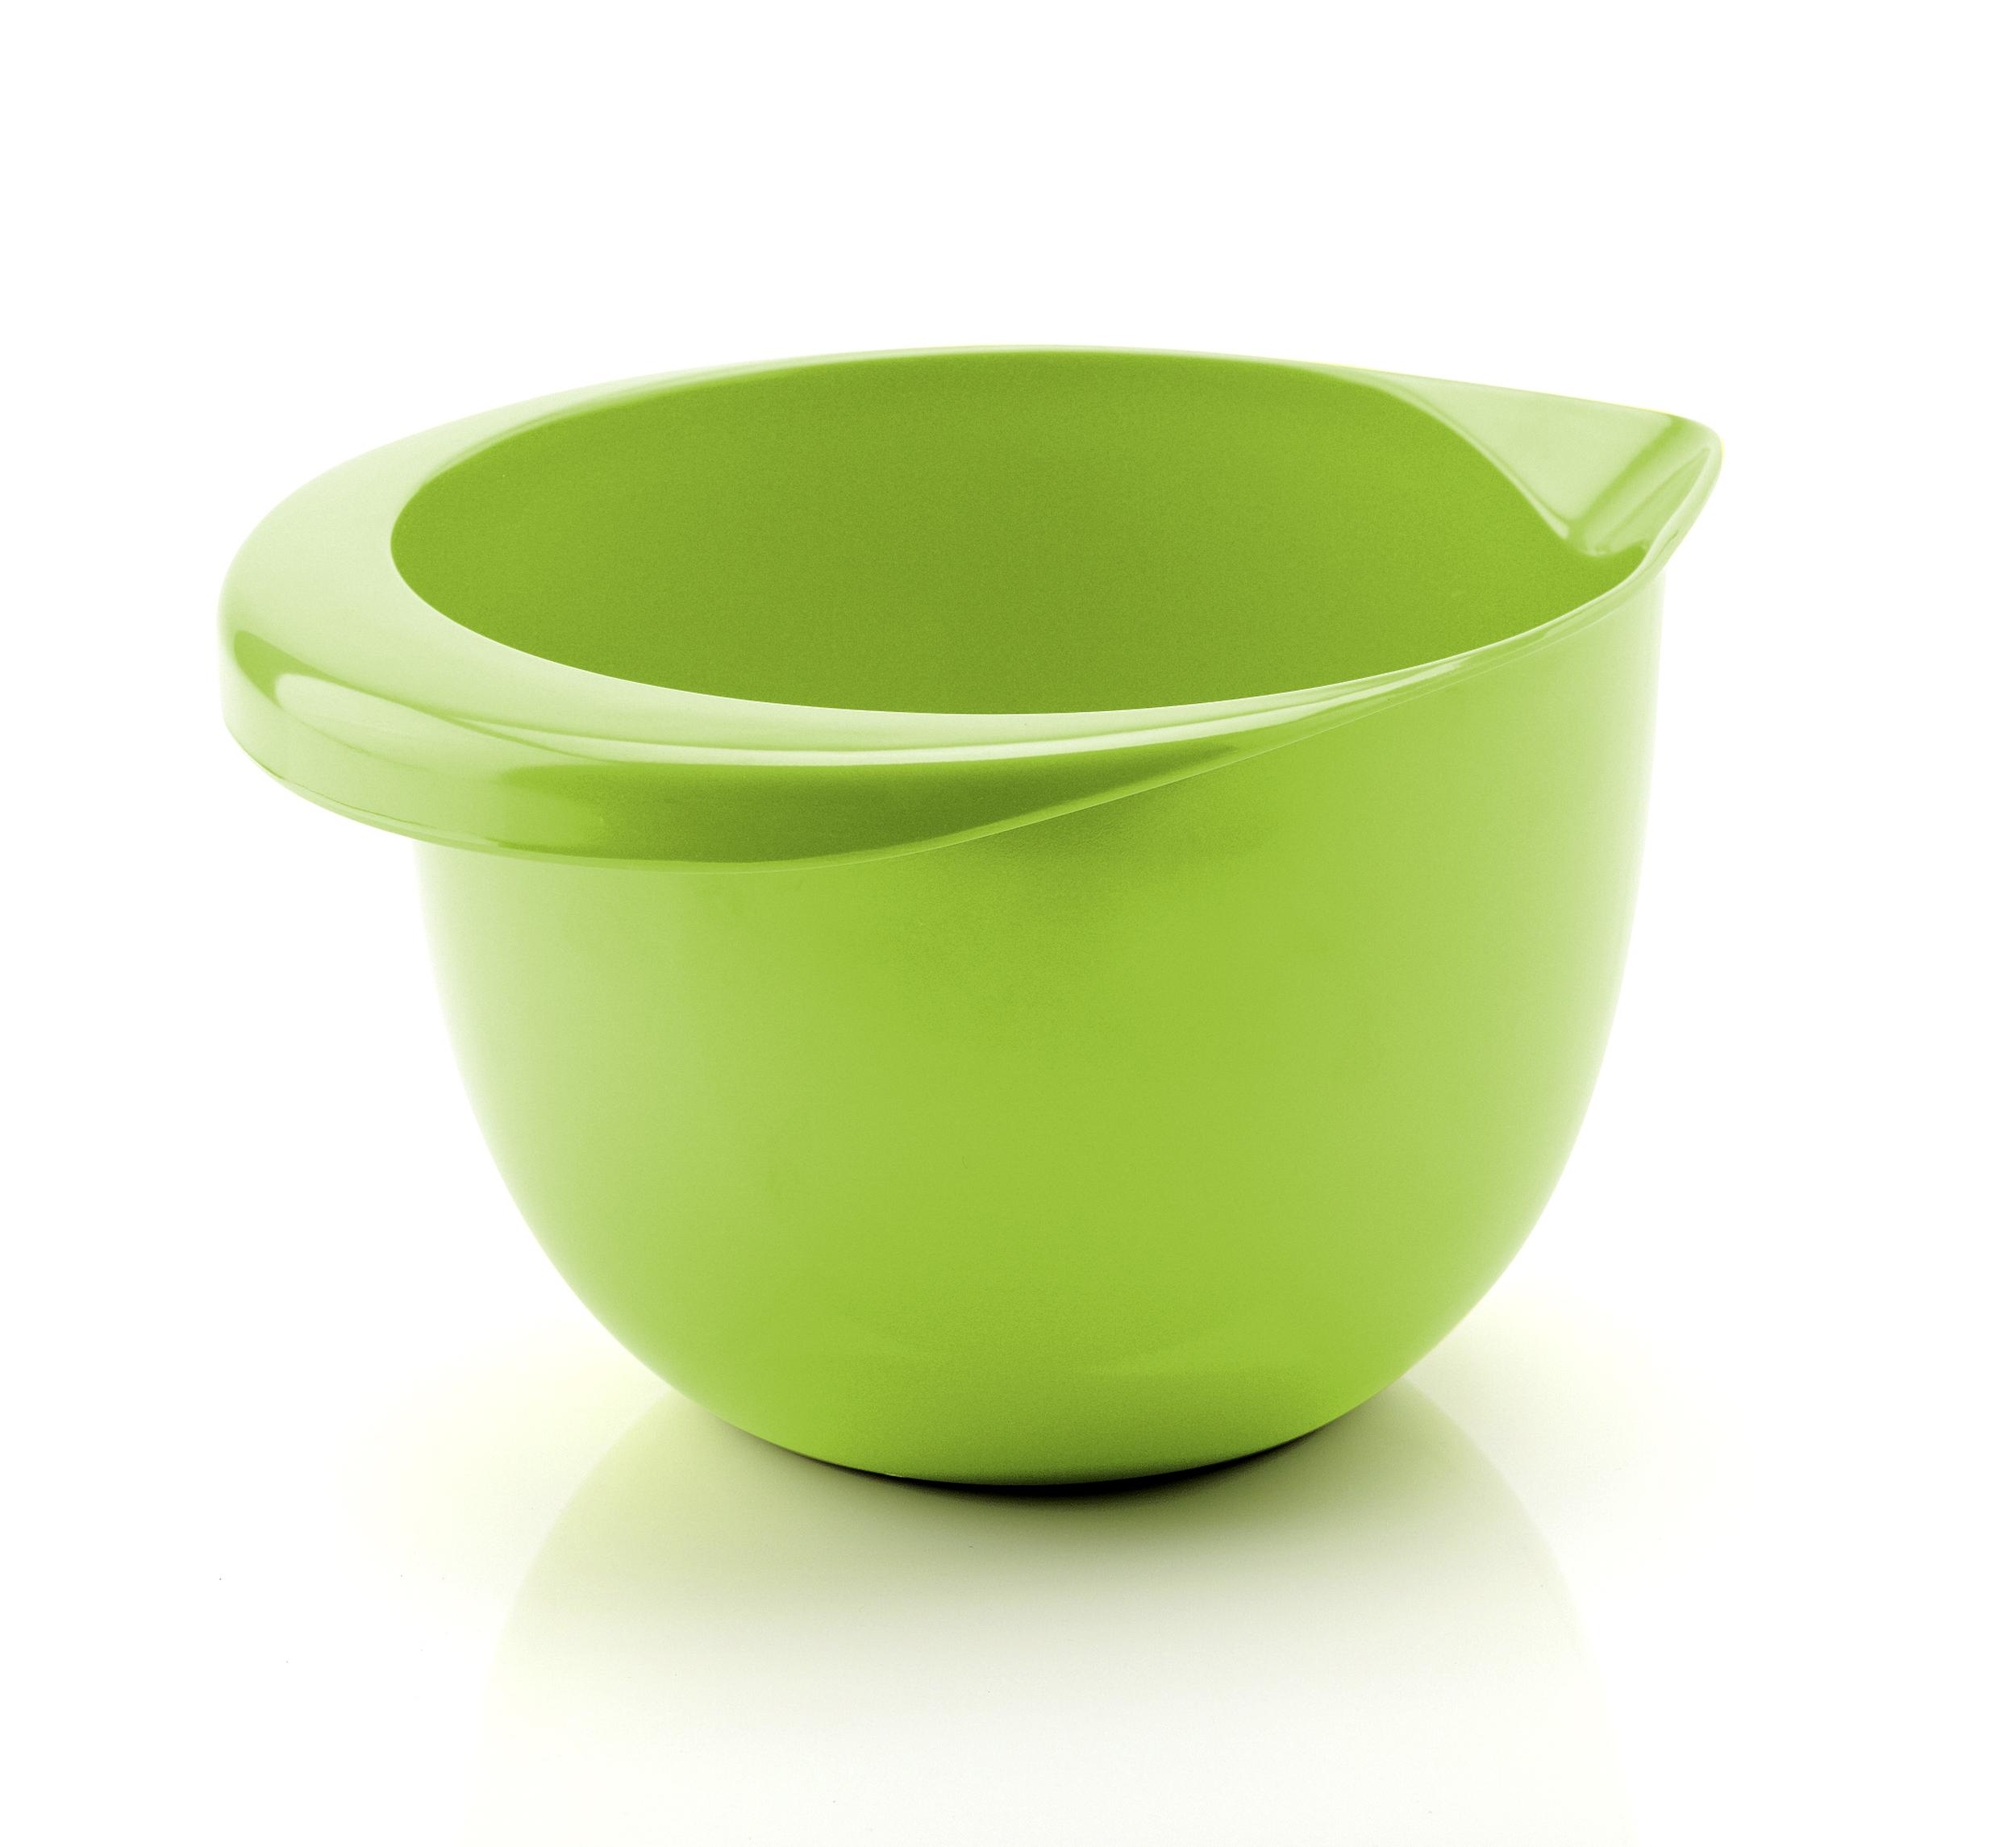 mixing bowls4.jpg